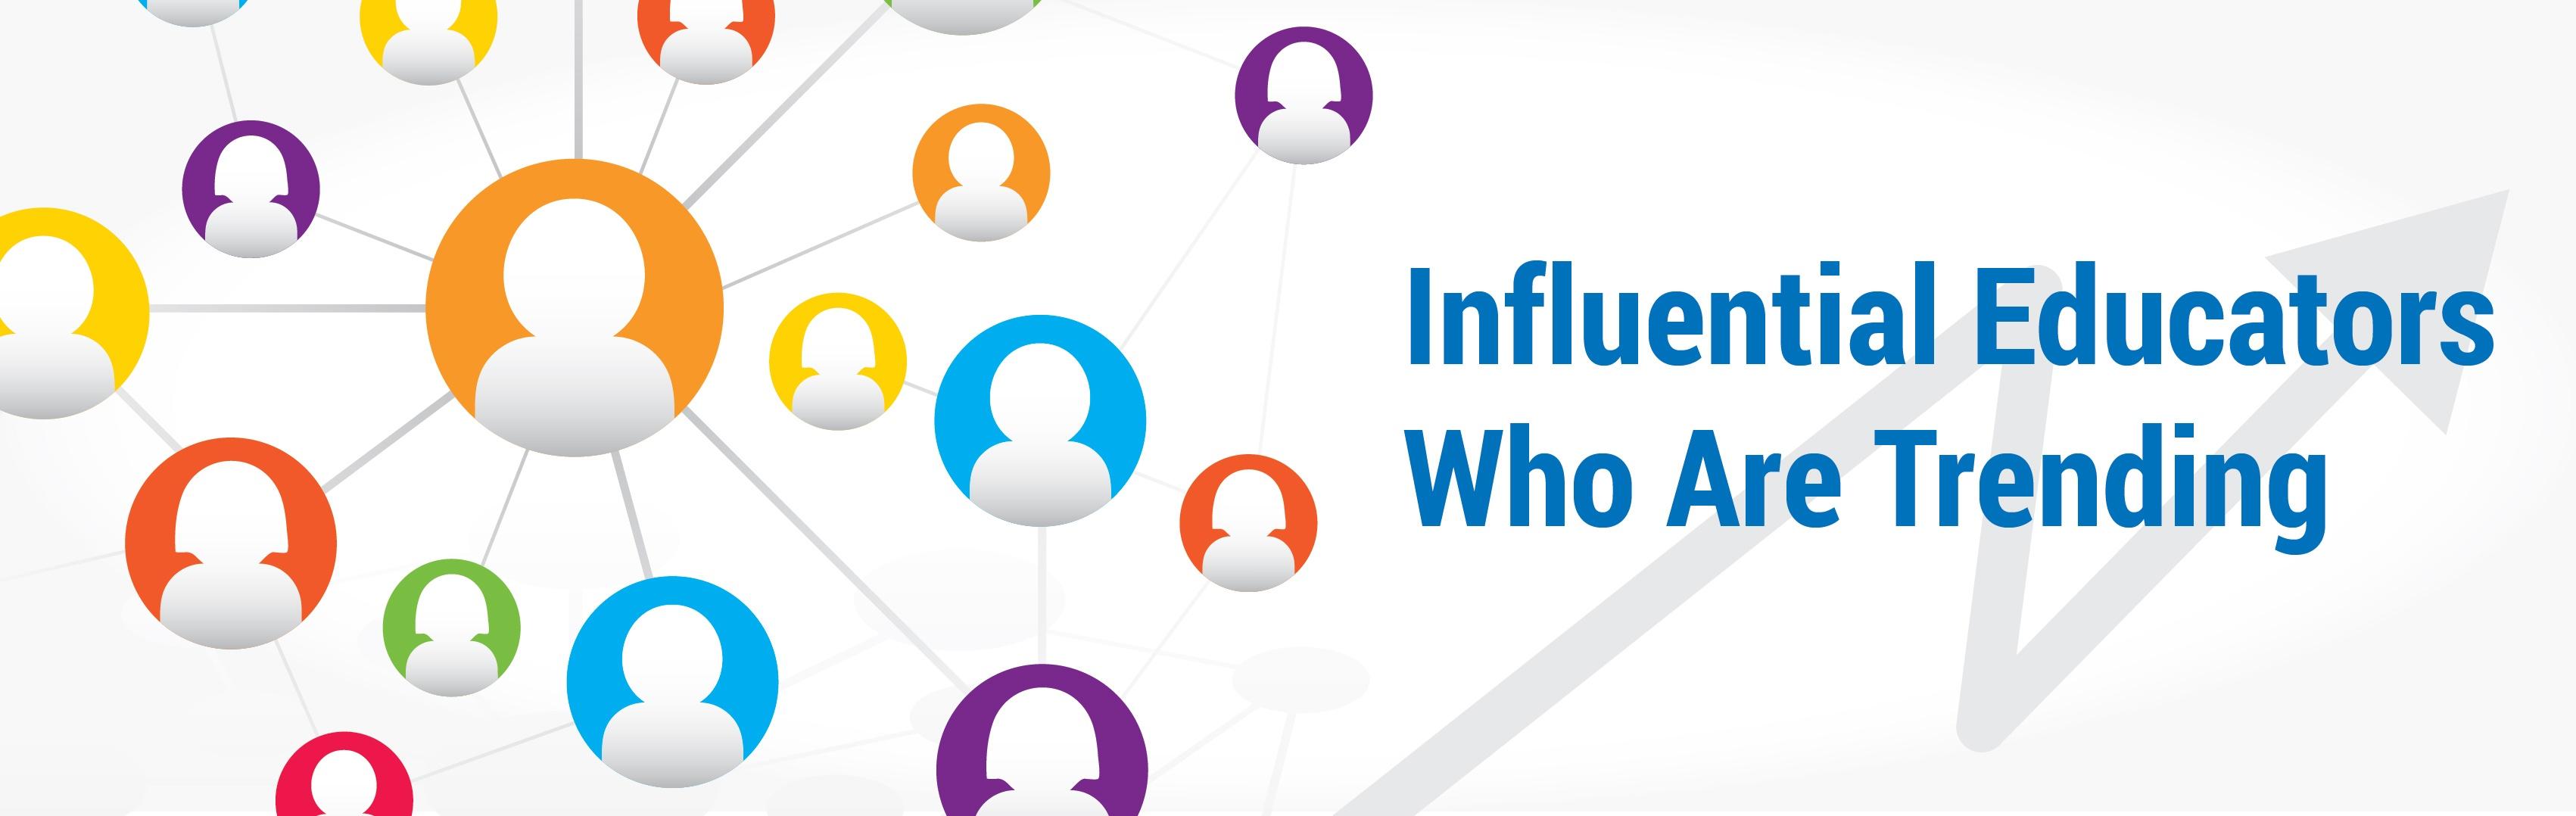 InfluentialEducators_Trending-01.jpg